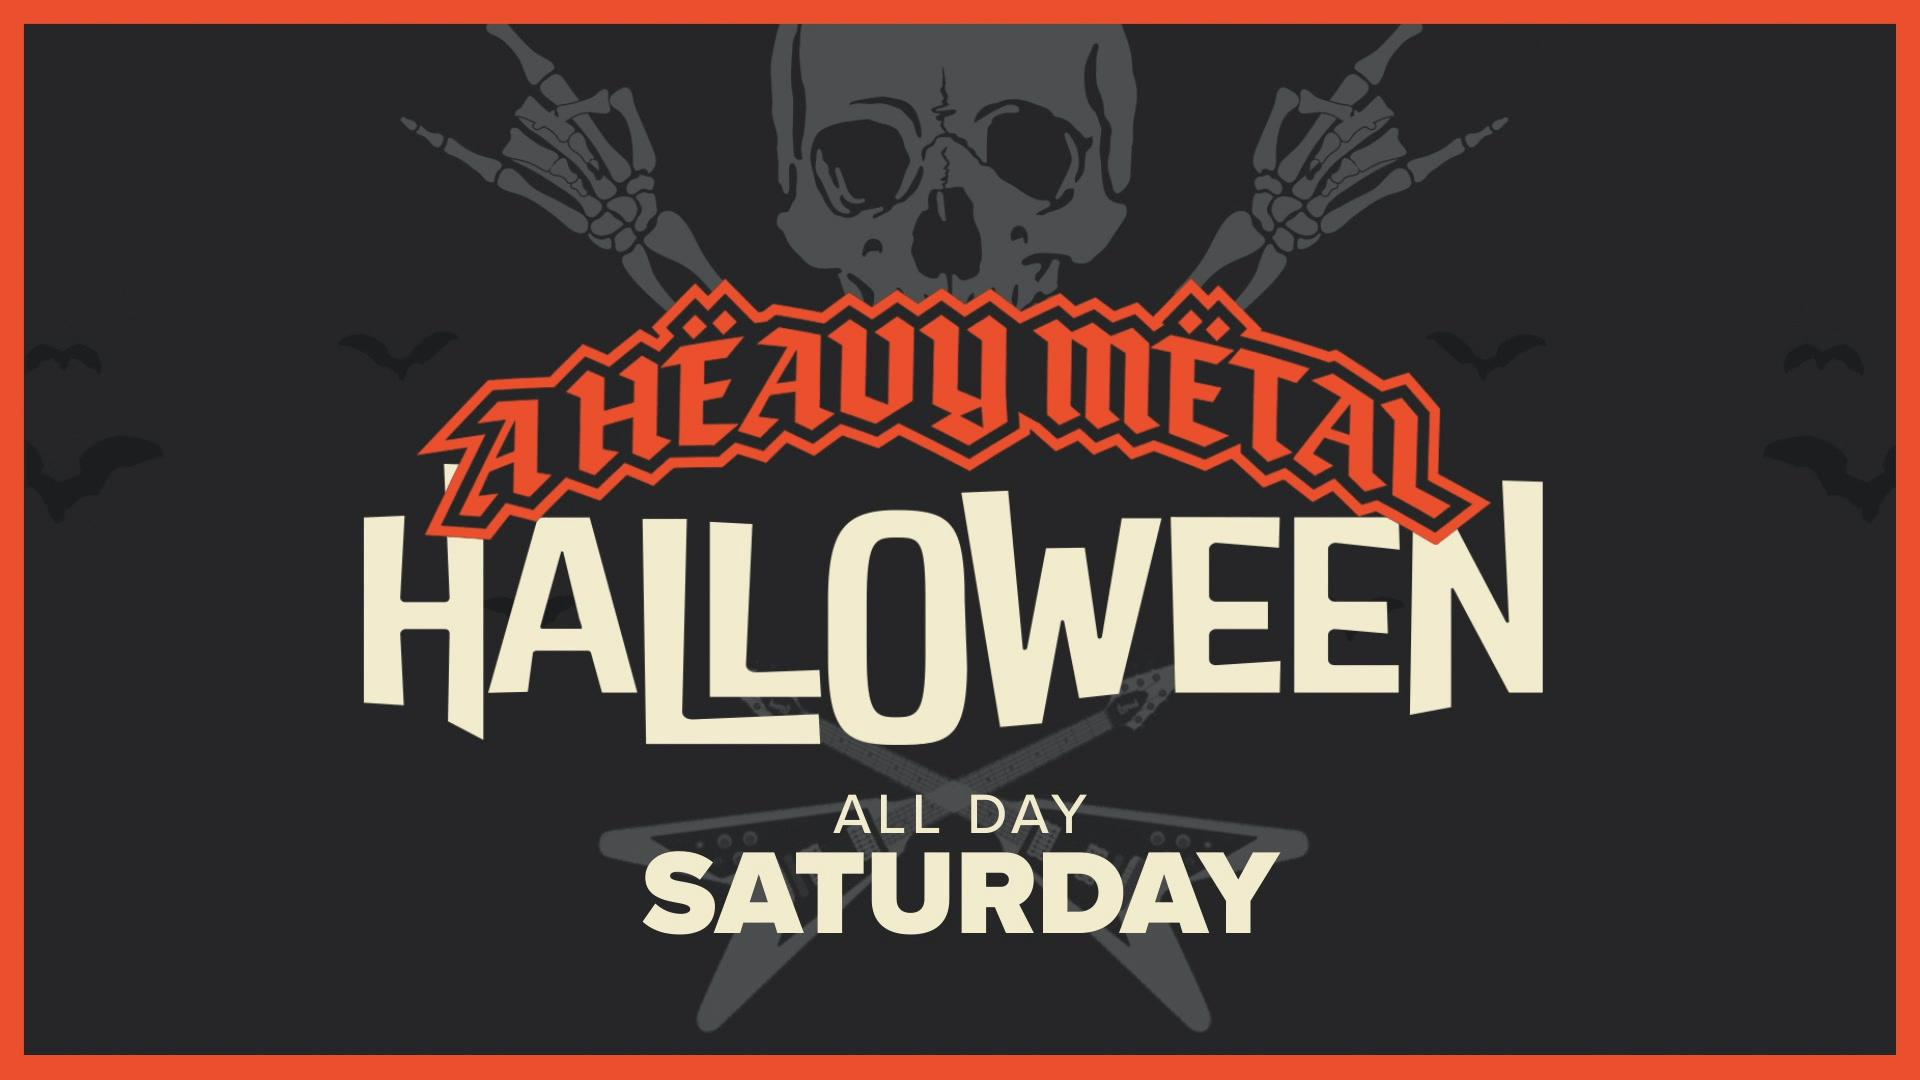 A Heavy Metal Halloween